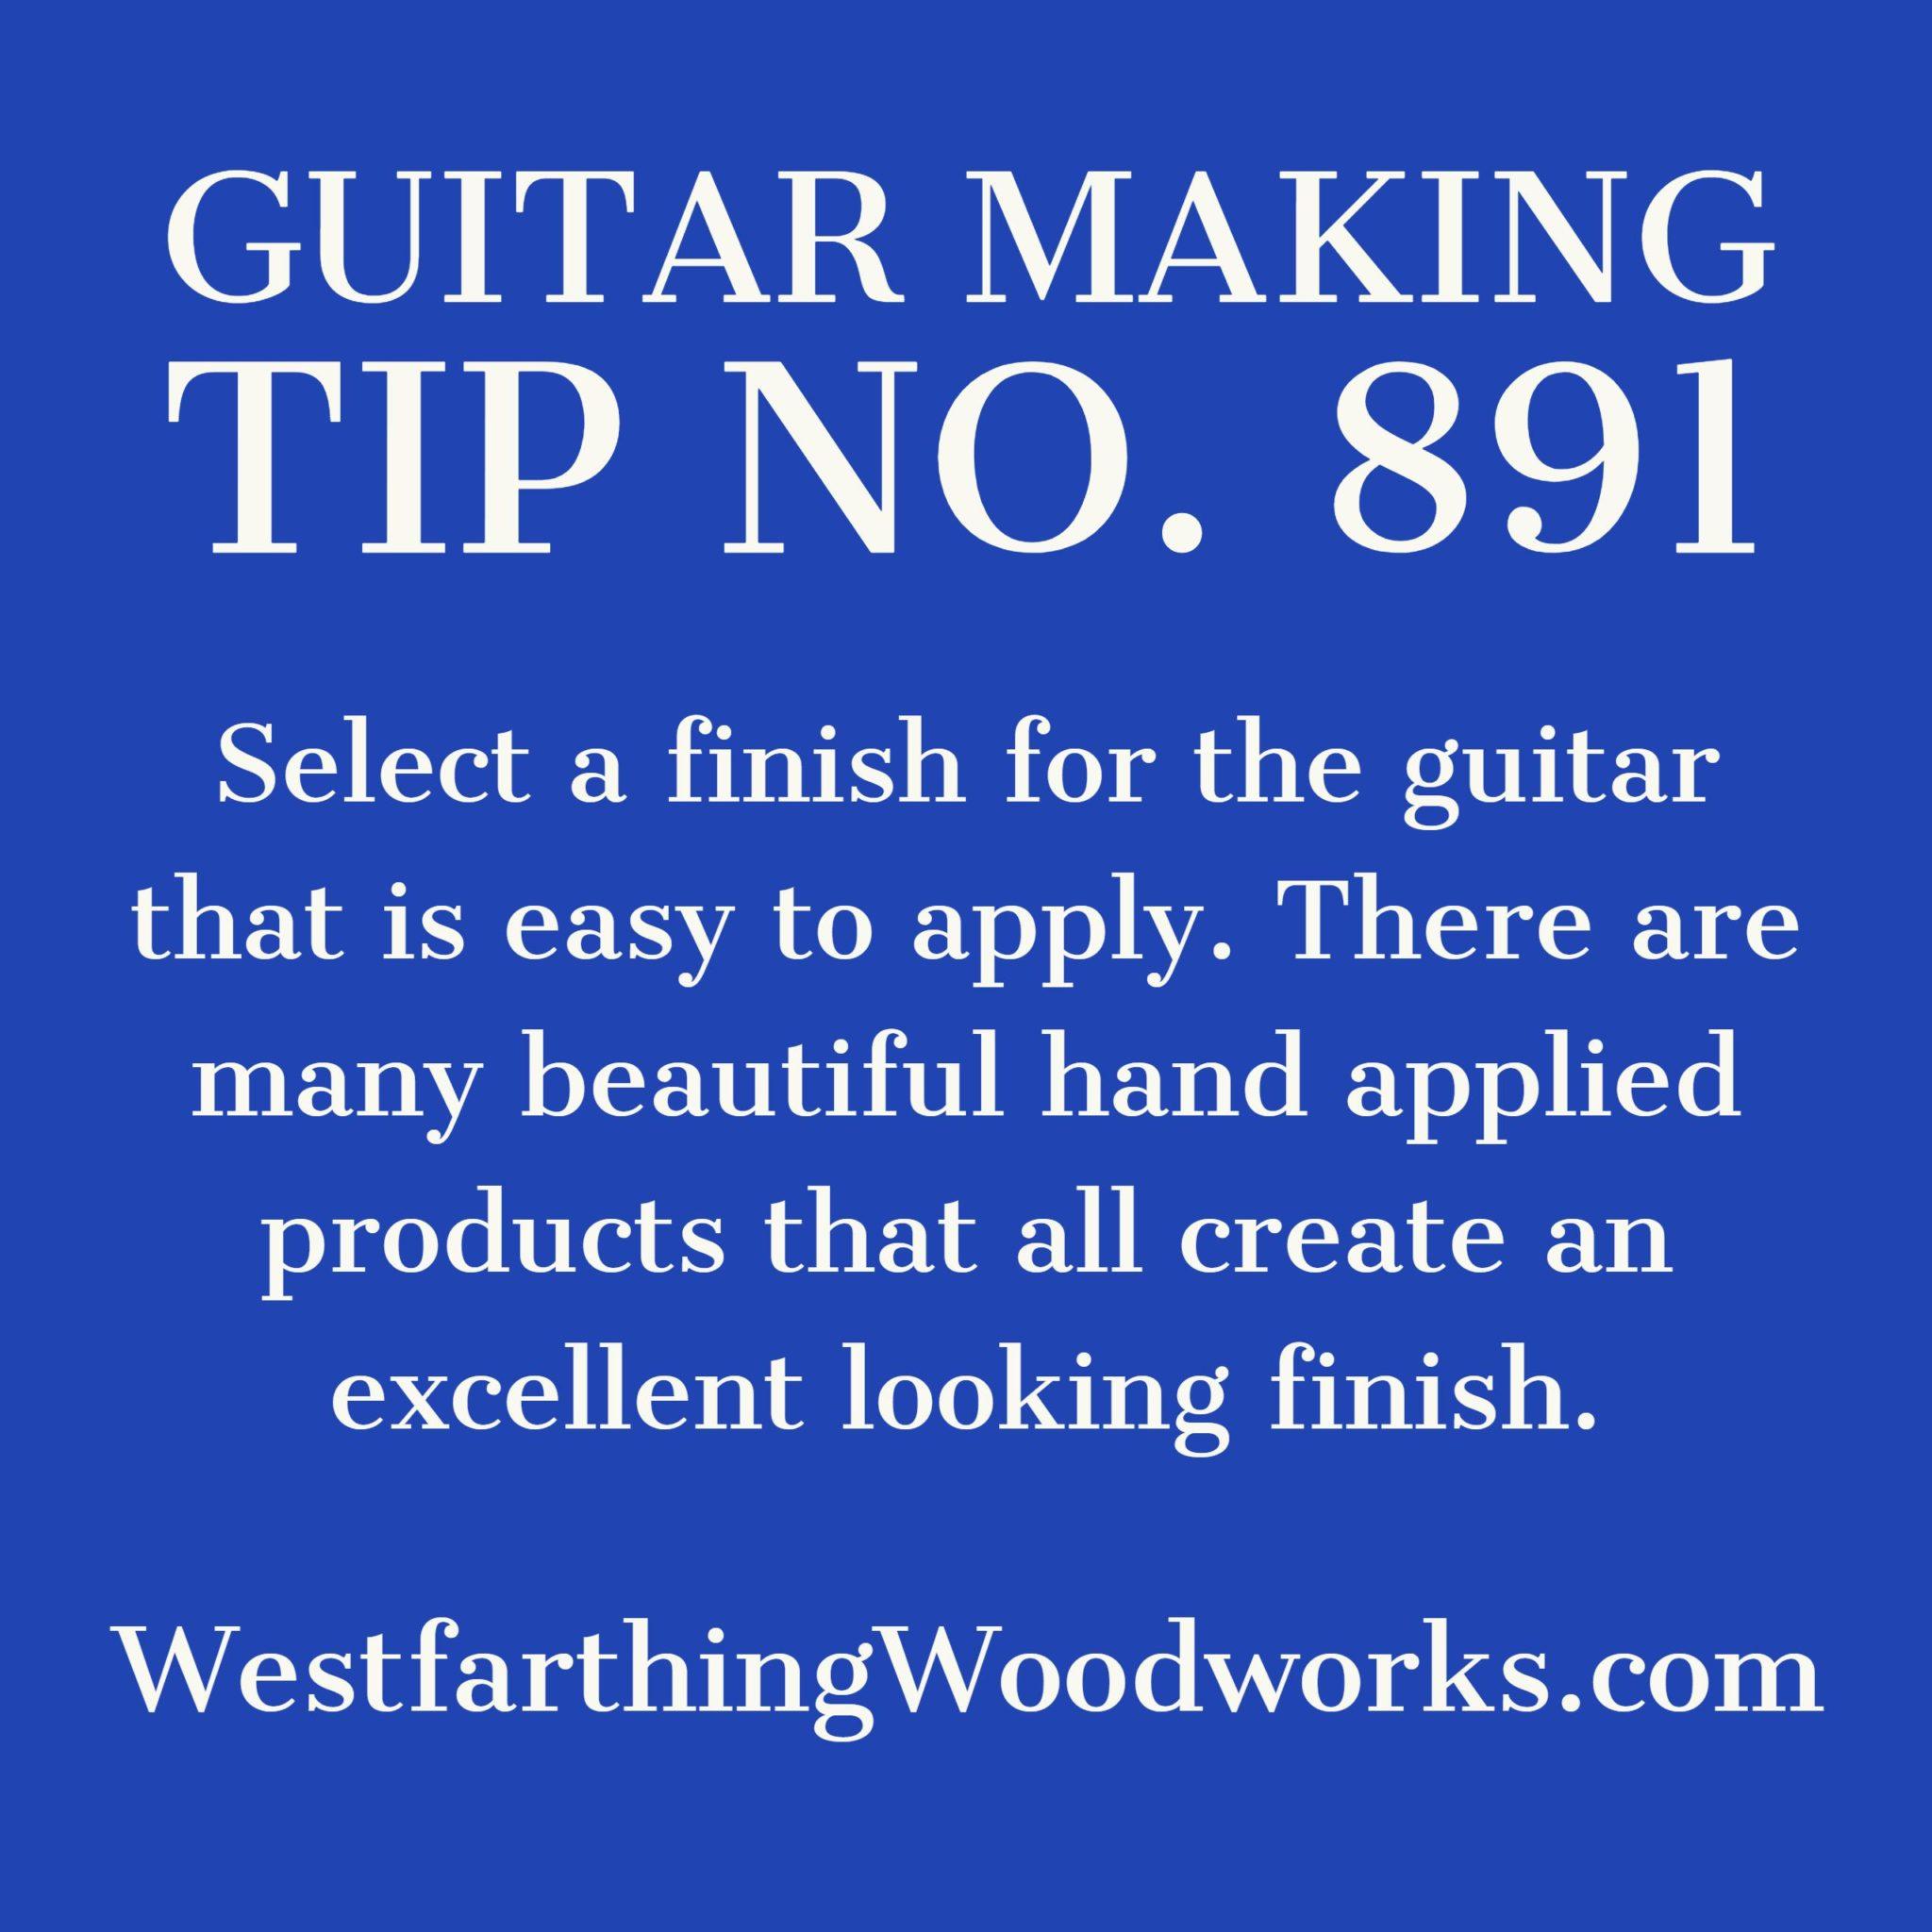 guitar making tip number 891